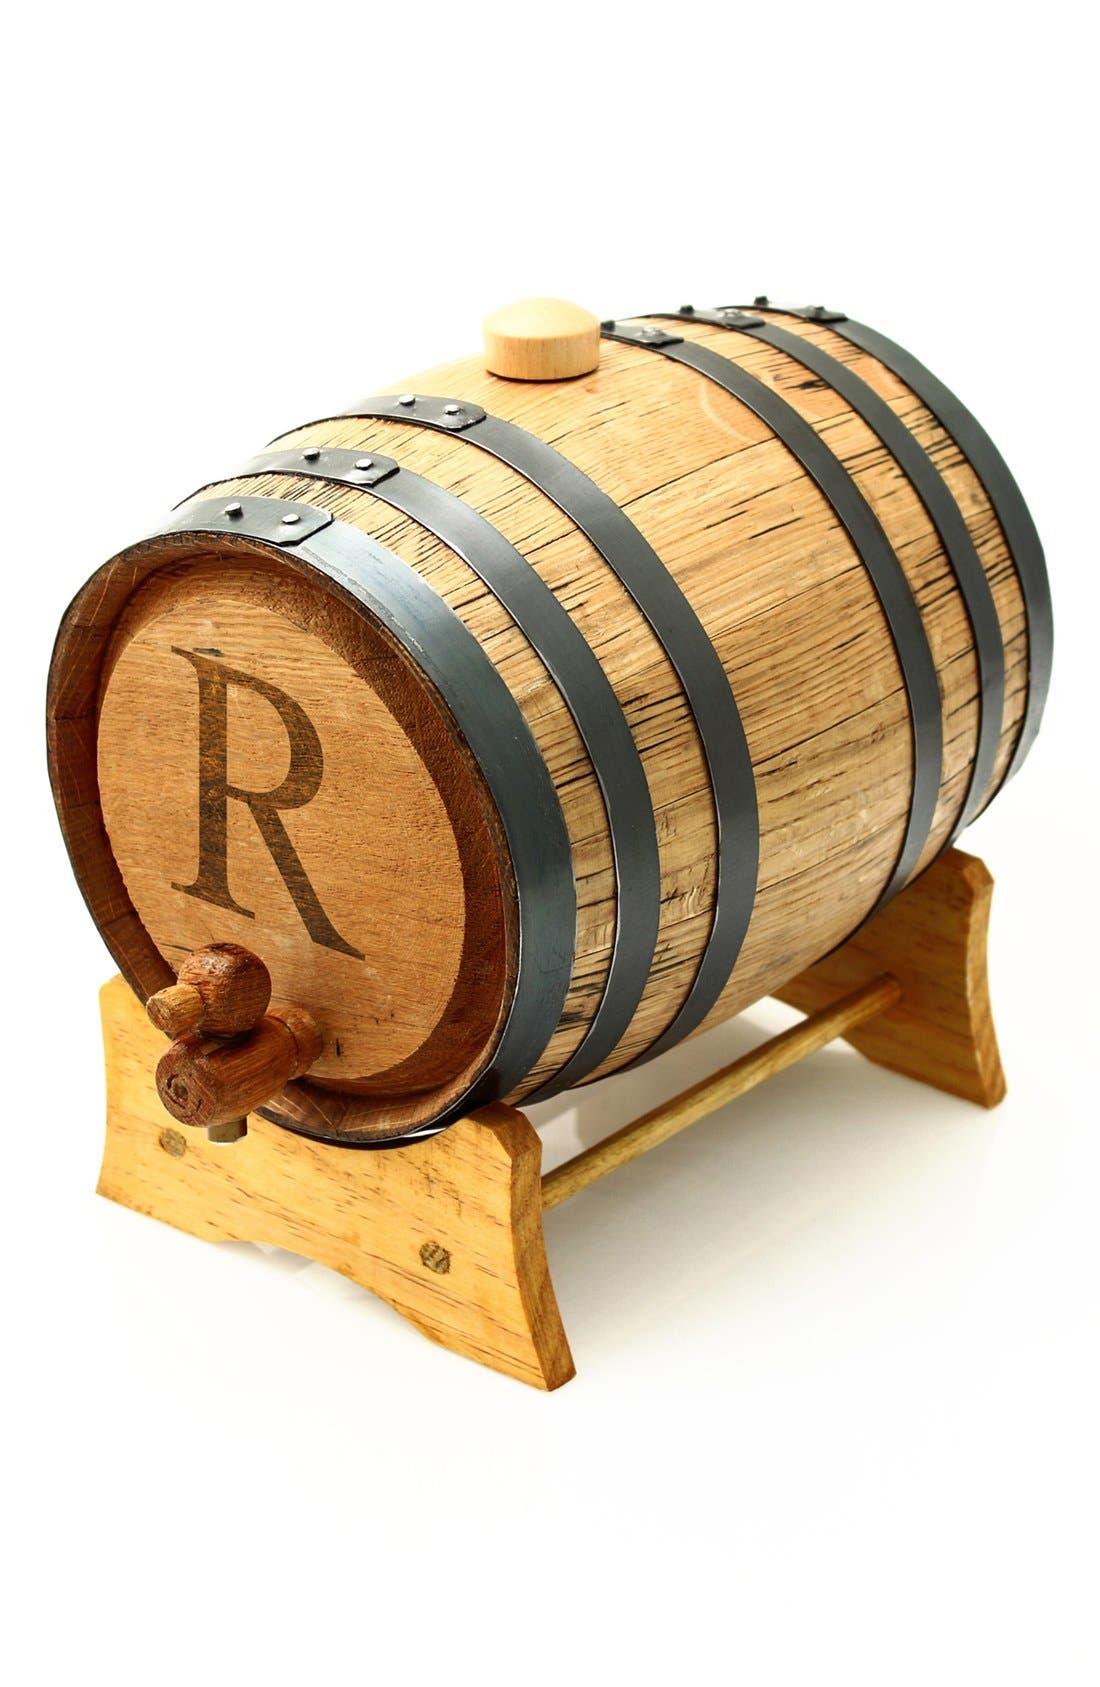 Main Image - Cathy's Concepts Monogram Oak Whiskey Barrel, Large